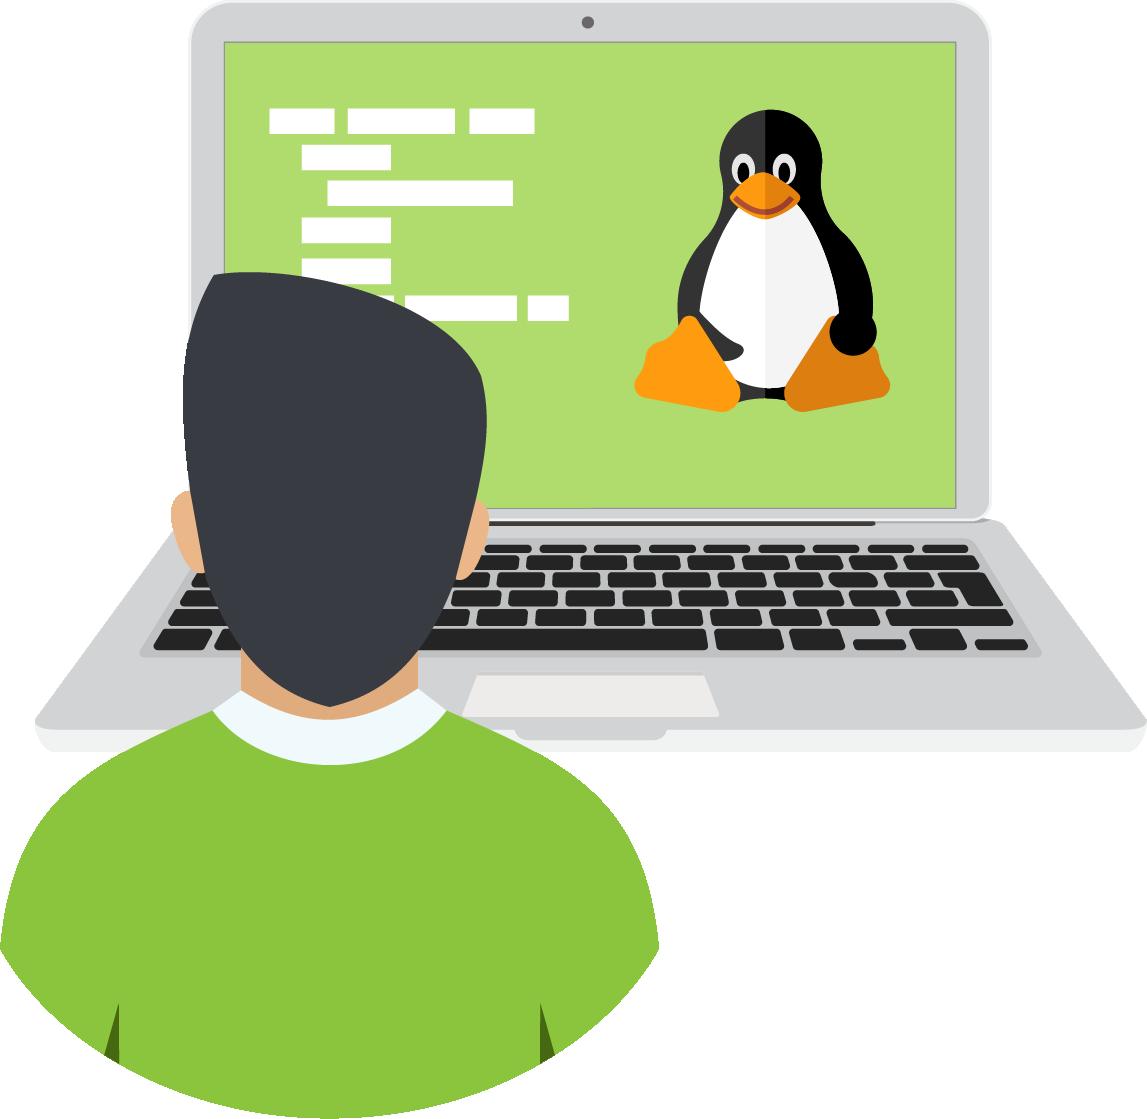 Sistema operativo Linux - Now Computer Torino